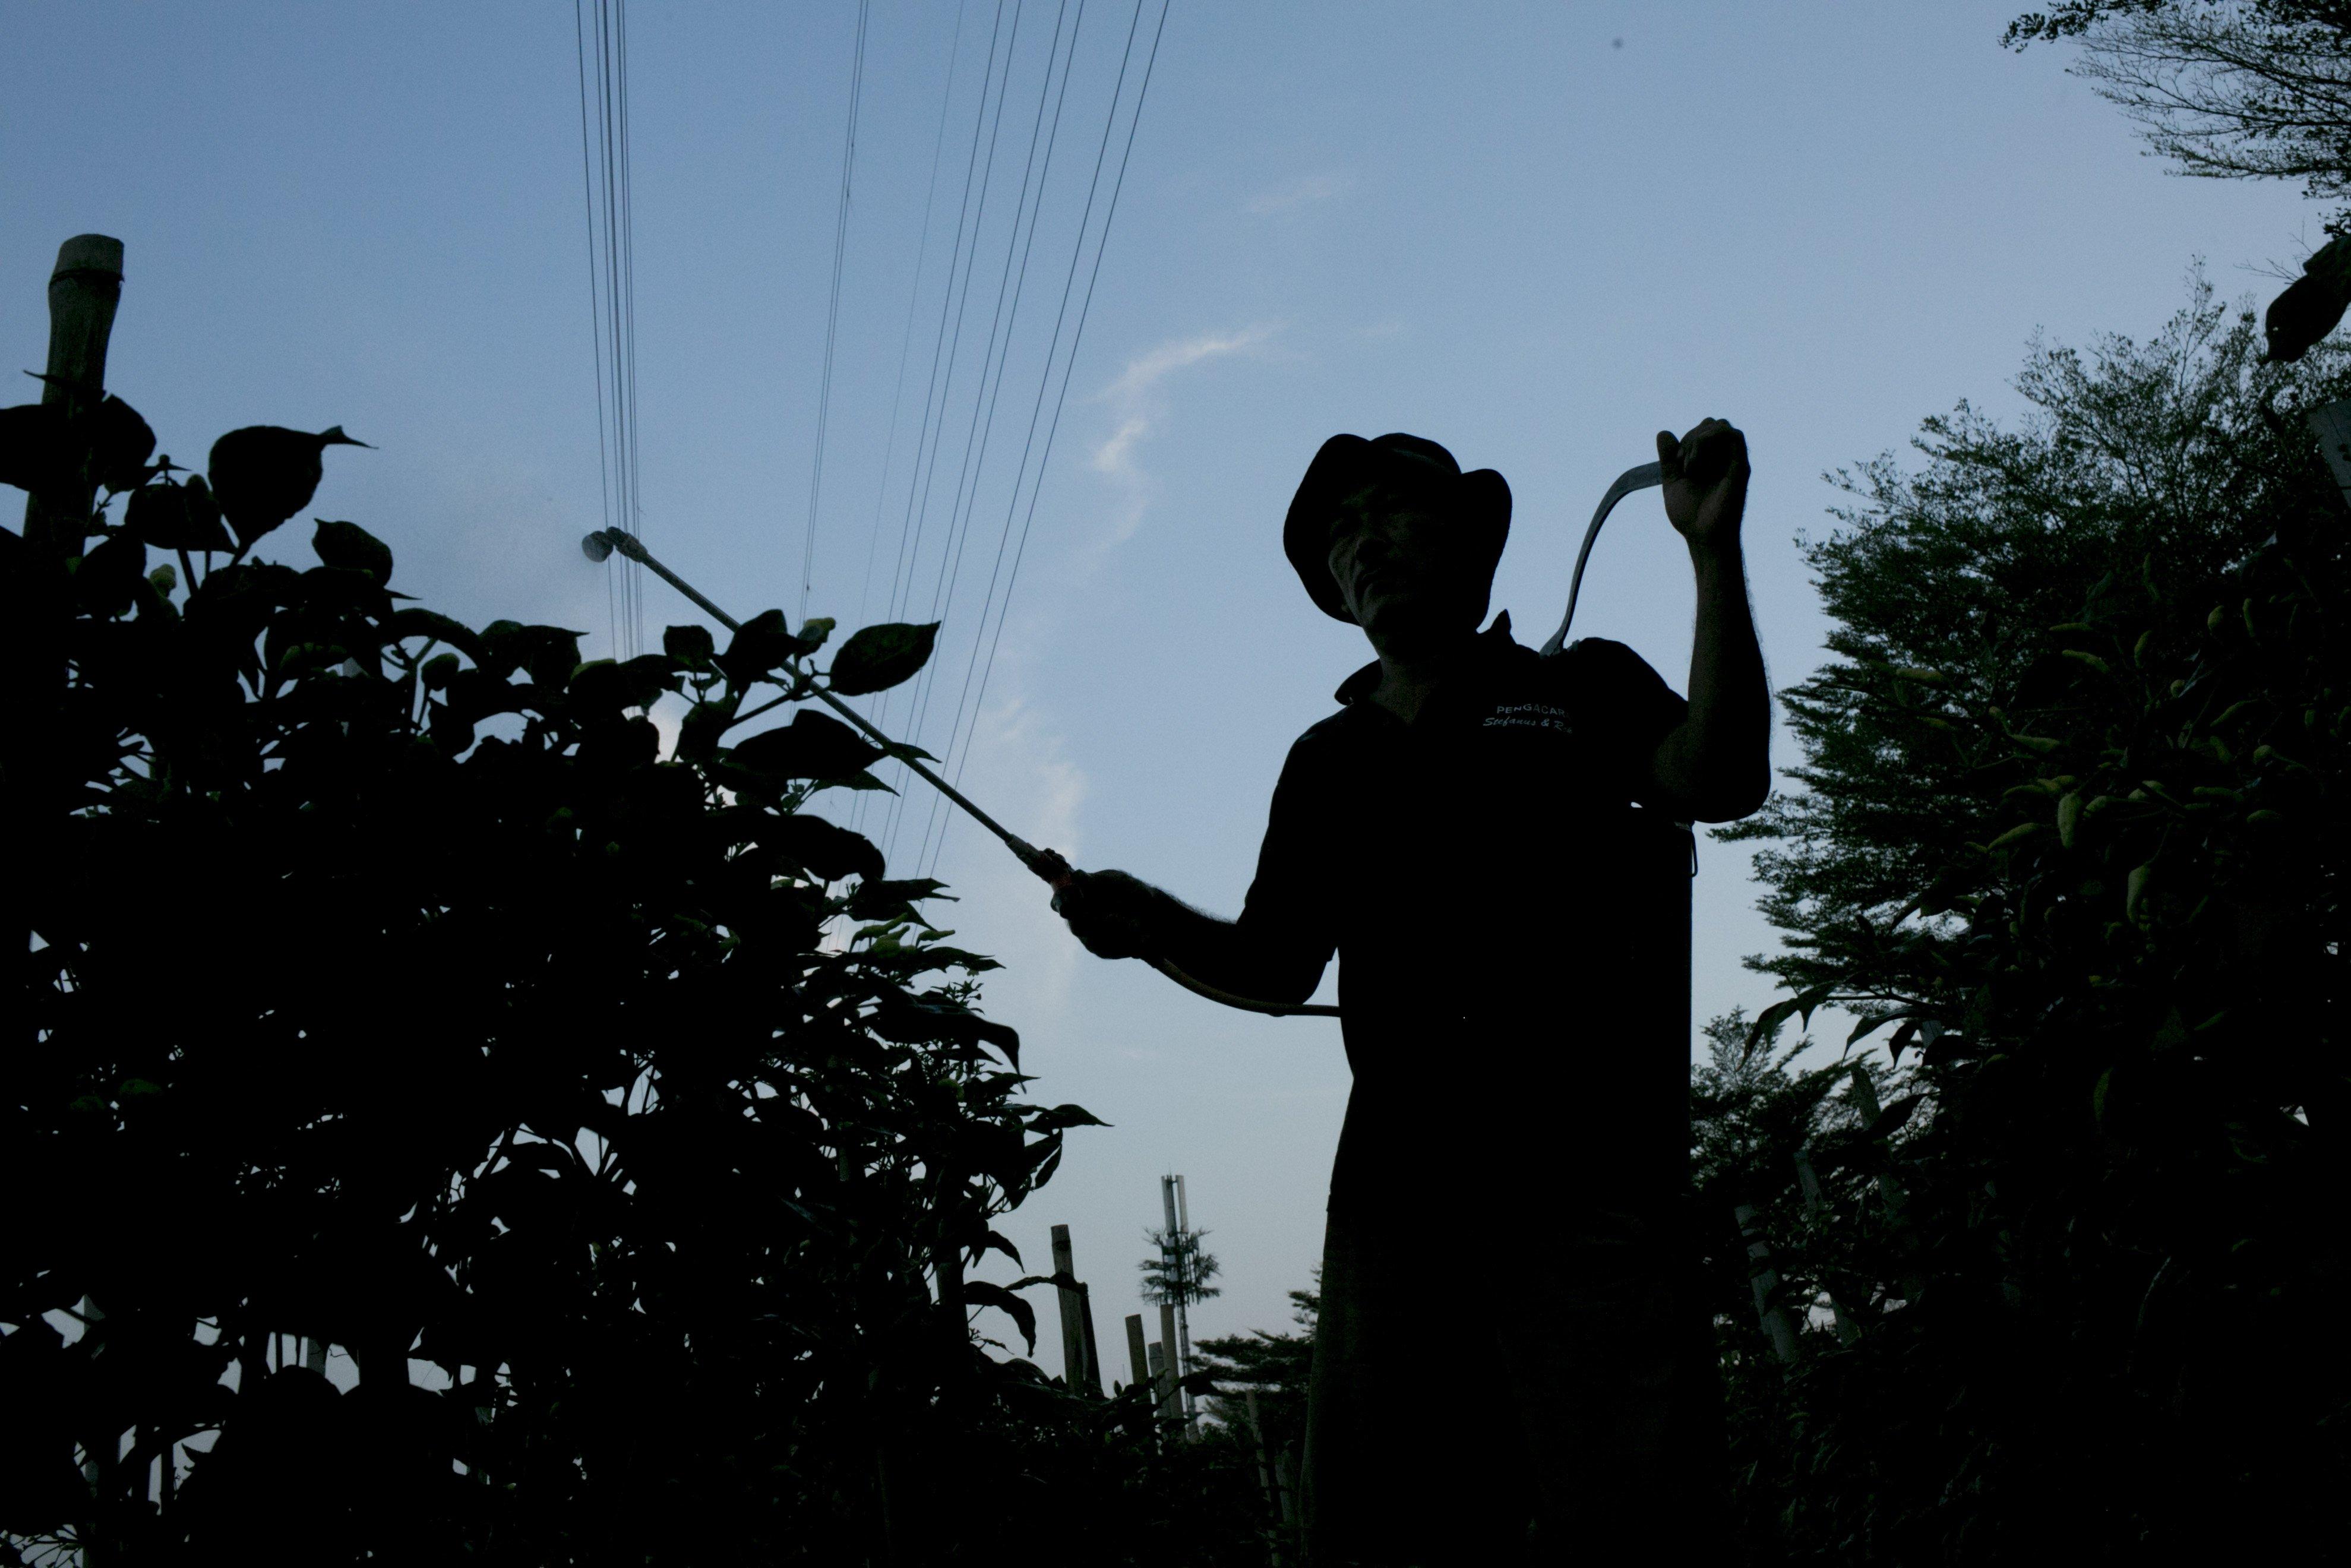 Andi (50) menyiram tanaman di bantaran Sungai Ciliwung, Petamburan, Jakarta Pusat, Minggu (12/7/2020). Selama enam tahun ia memanfaatkan lahan bantaran kali Ciliwung untuk bertani bersama kelompok Mandiri Indah Tani sebagai upaya memenuhi kebutuhan hidup diatas keterbatasan lahan dan kemampuan.